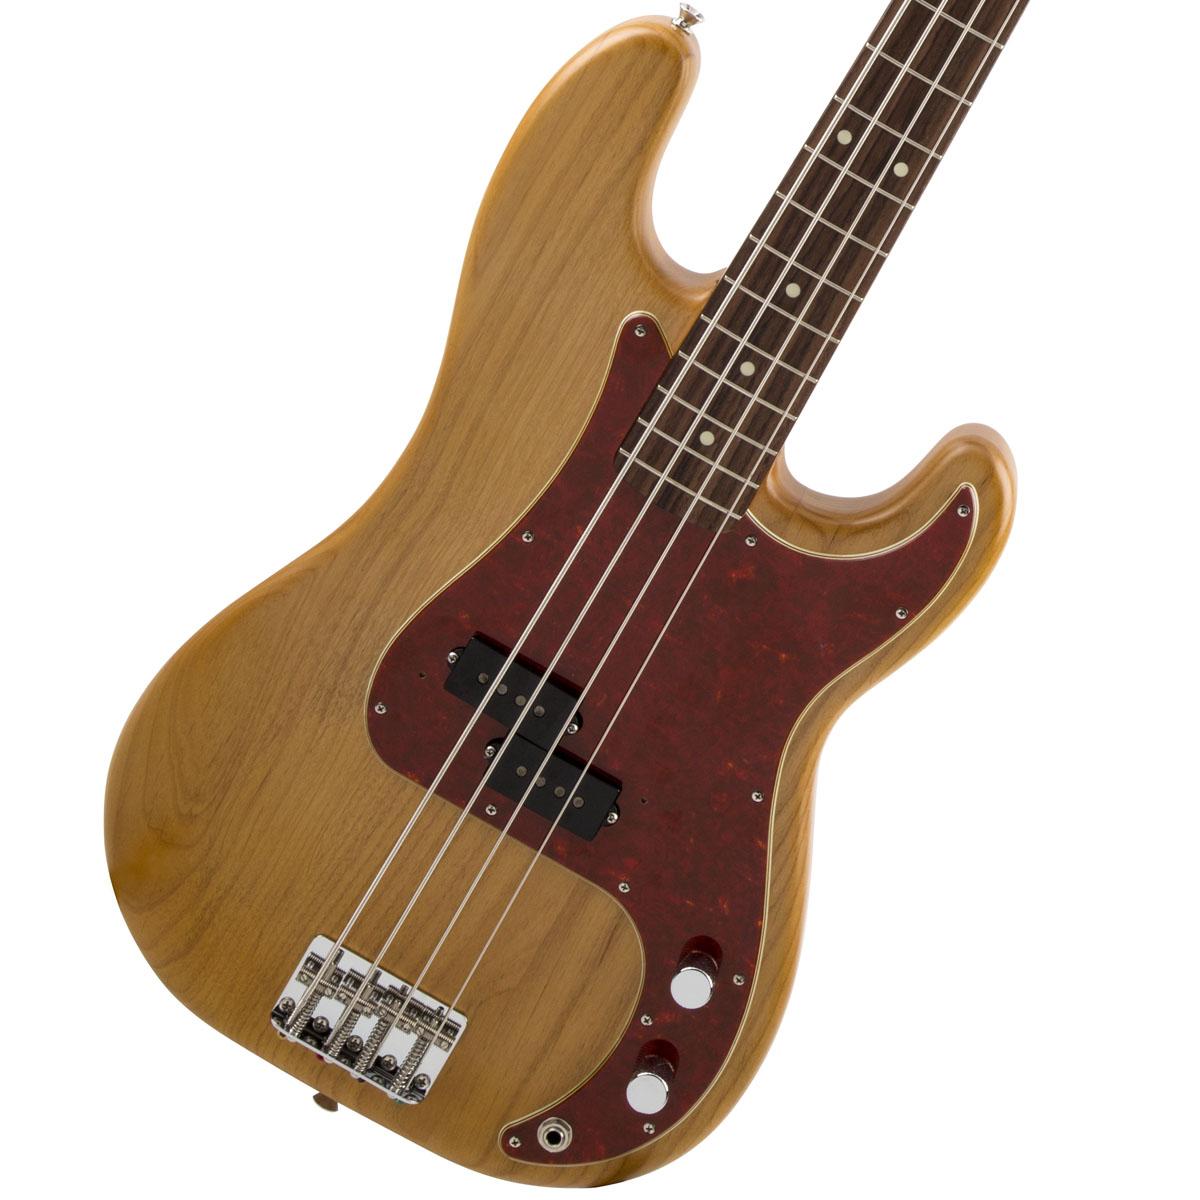 Fender / TOMOMI PRECISION BASS Satin Natural 【安心2年保証】【池袋店】